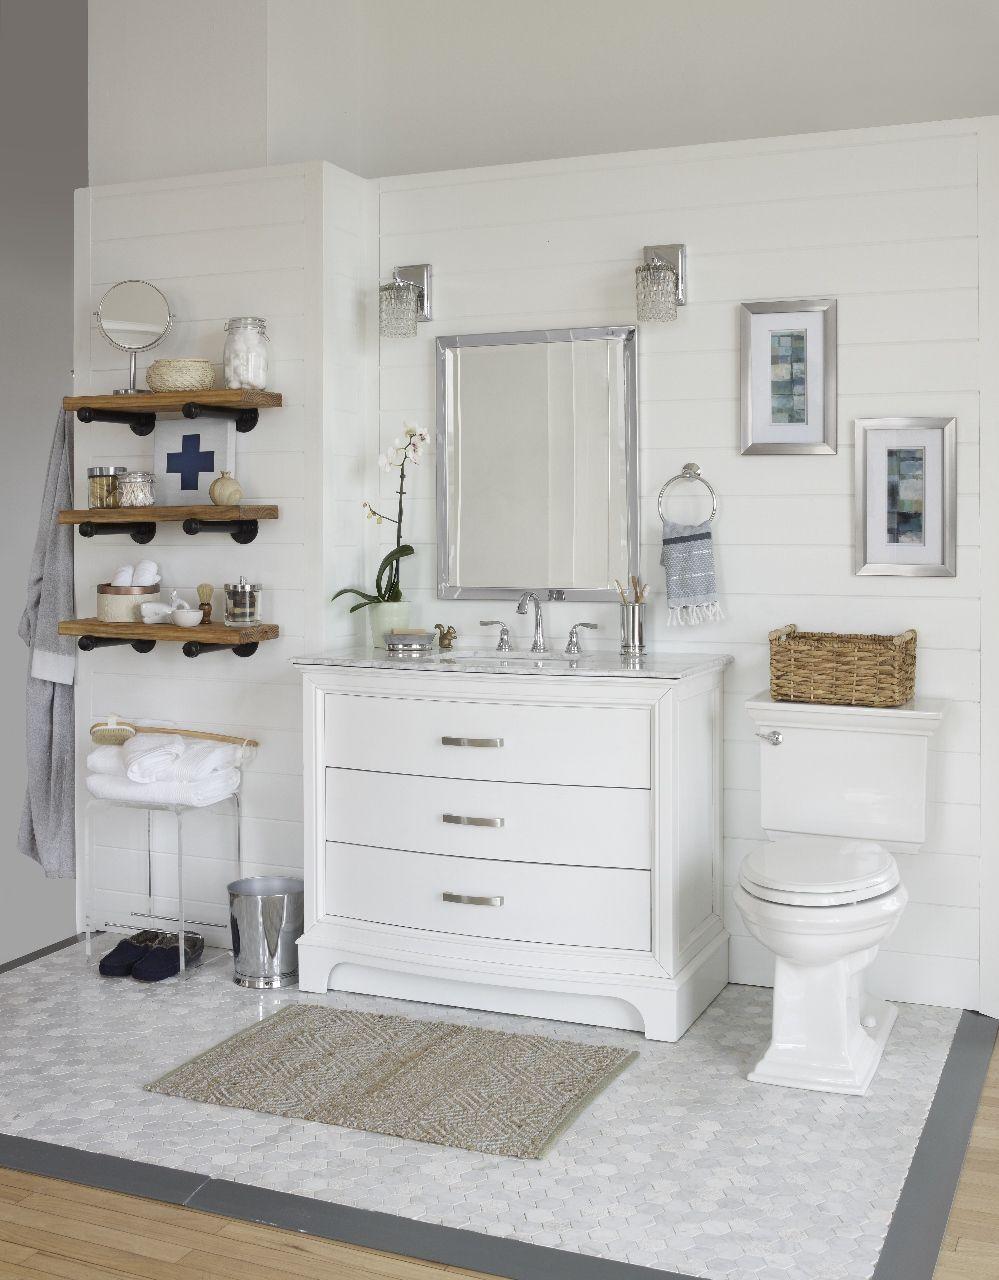 A Modern Rustic Bathroom Reveal City Farmhouse Rustic Bathroom Rustic Bathroom Shelves Rustic Bathrooms